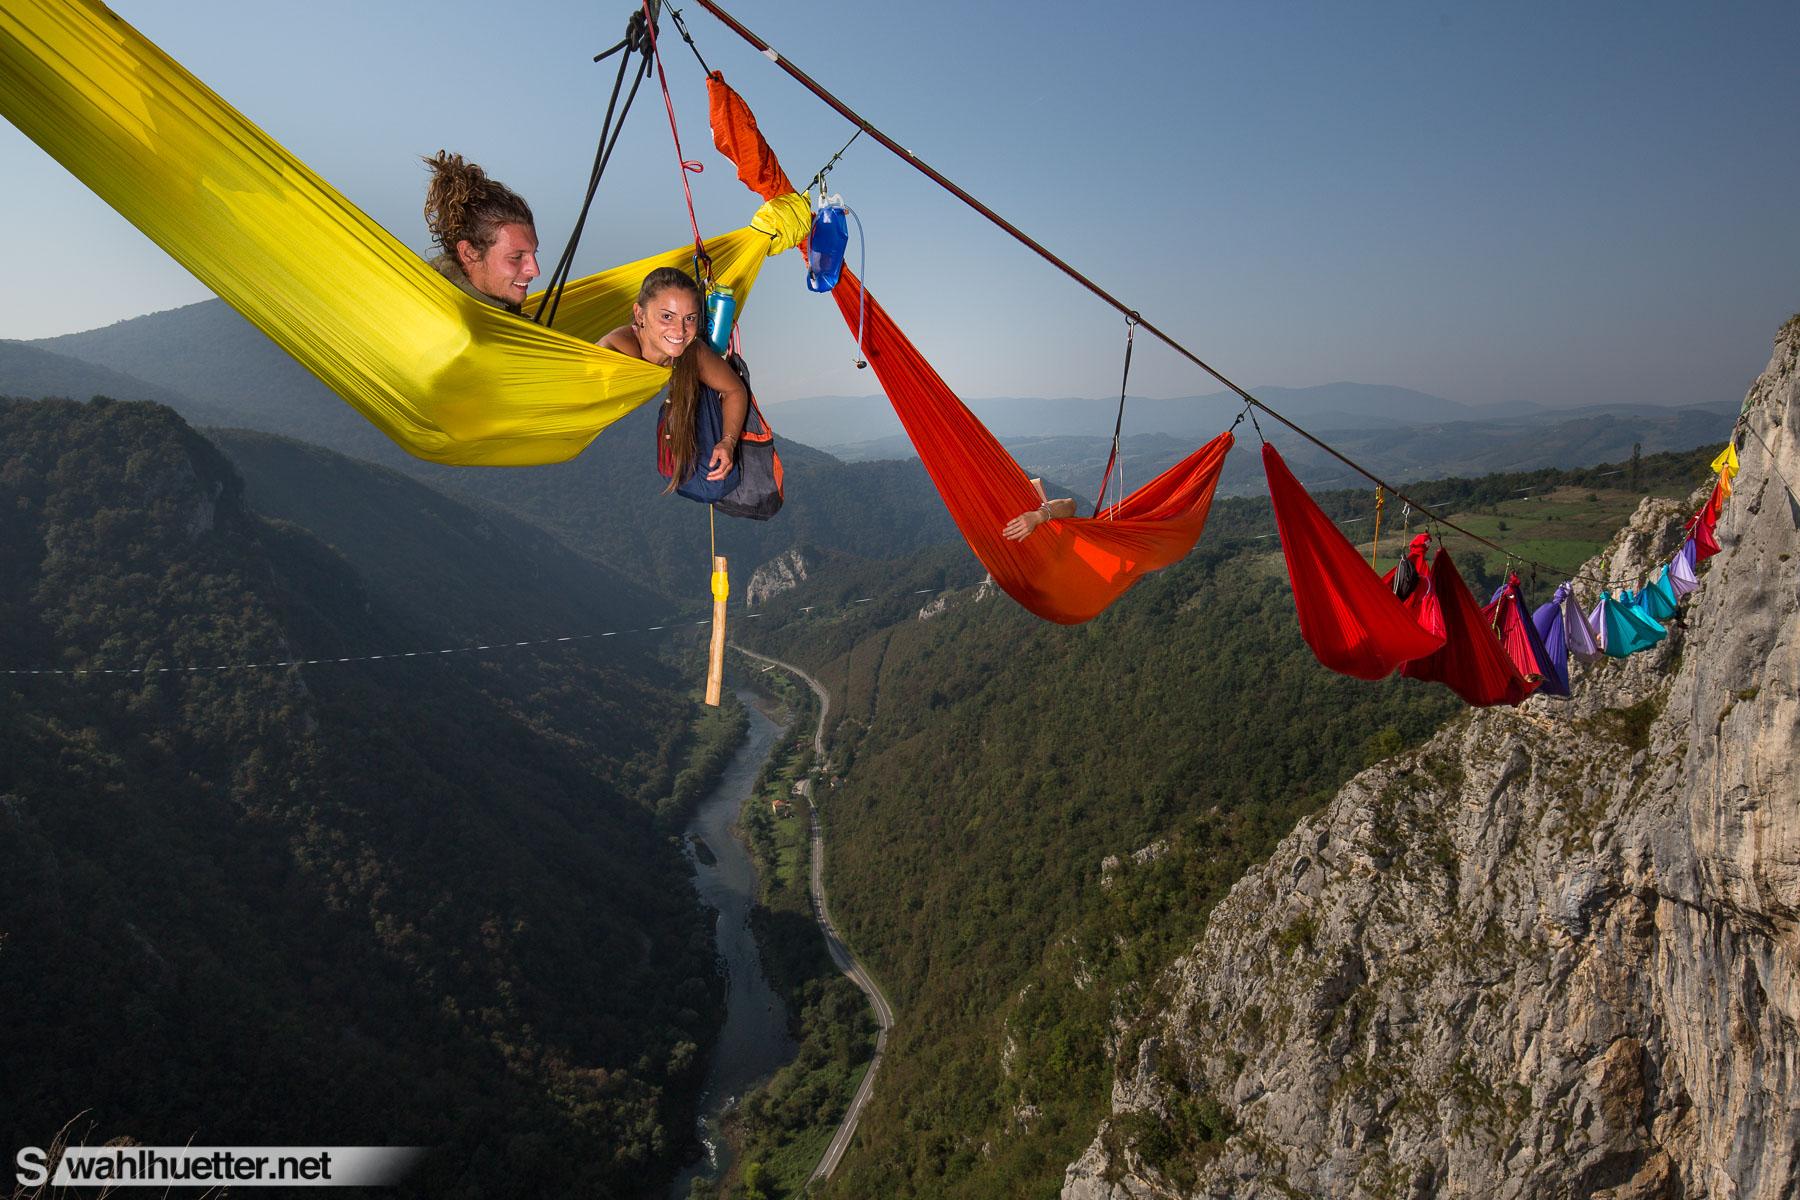 The Hammock Caravan goes Bosnia  Wahlhuetter